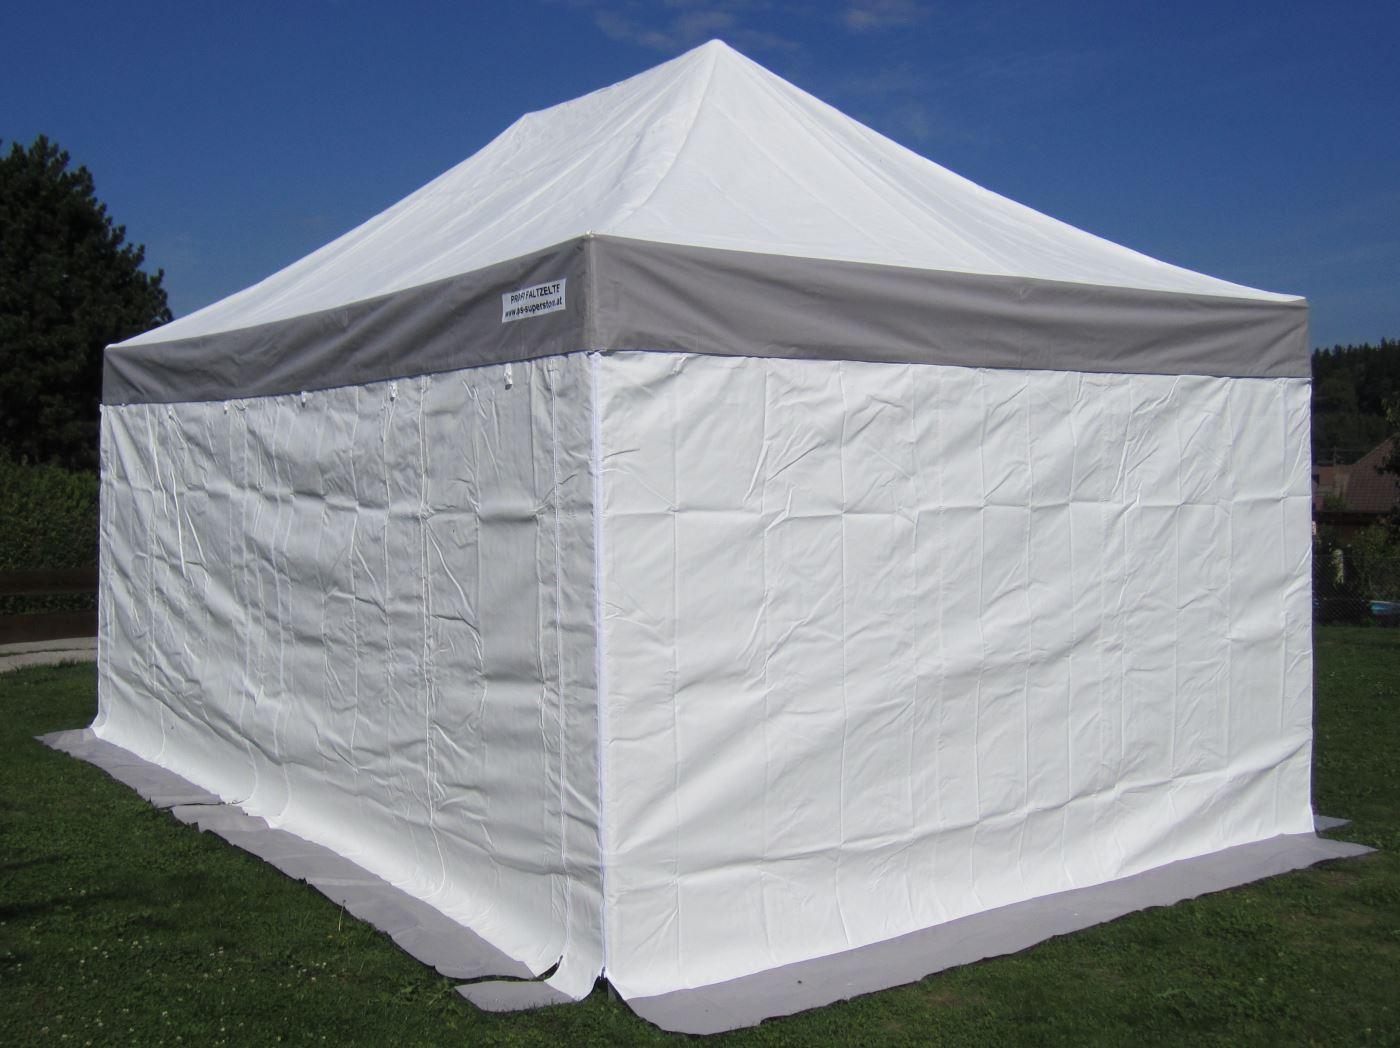 3x4 5m profi faltzelt marktzelt marktstand tent 50mm hex mit metallgelenken u pvc planen. Black Bedroom Furniture Sets. Home Design Ideas